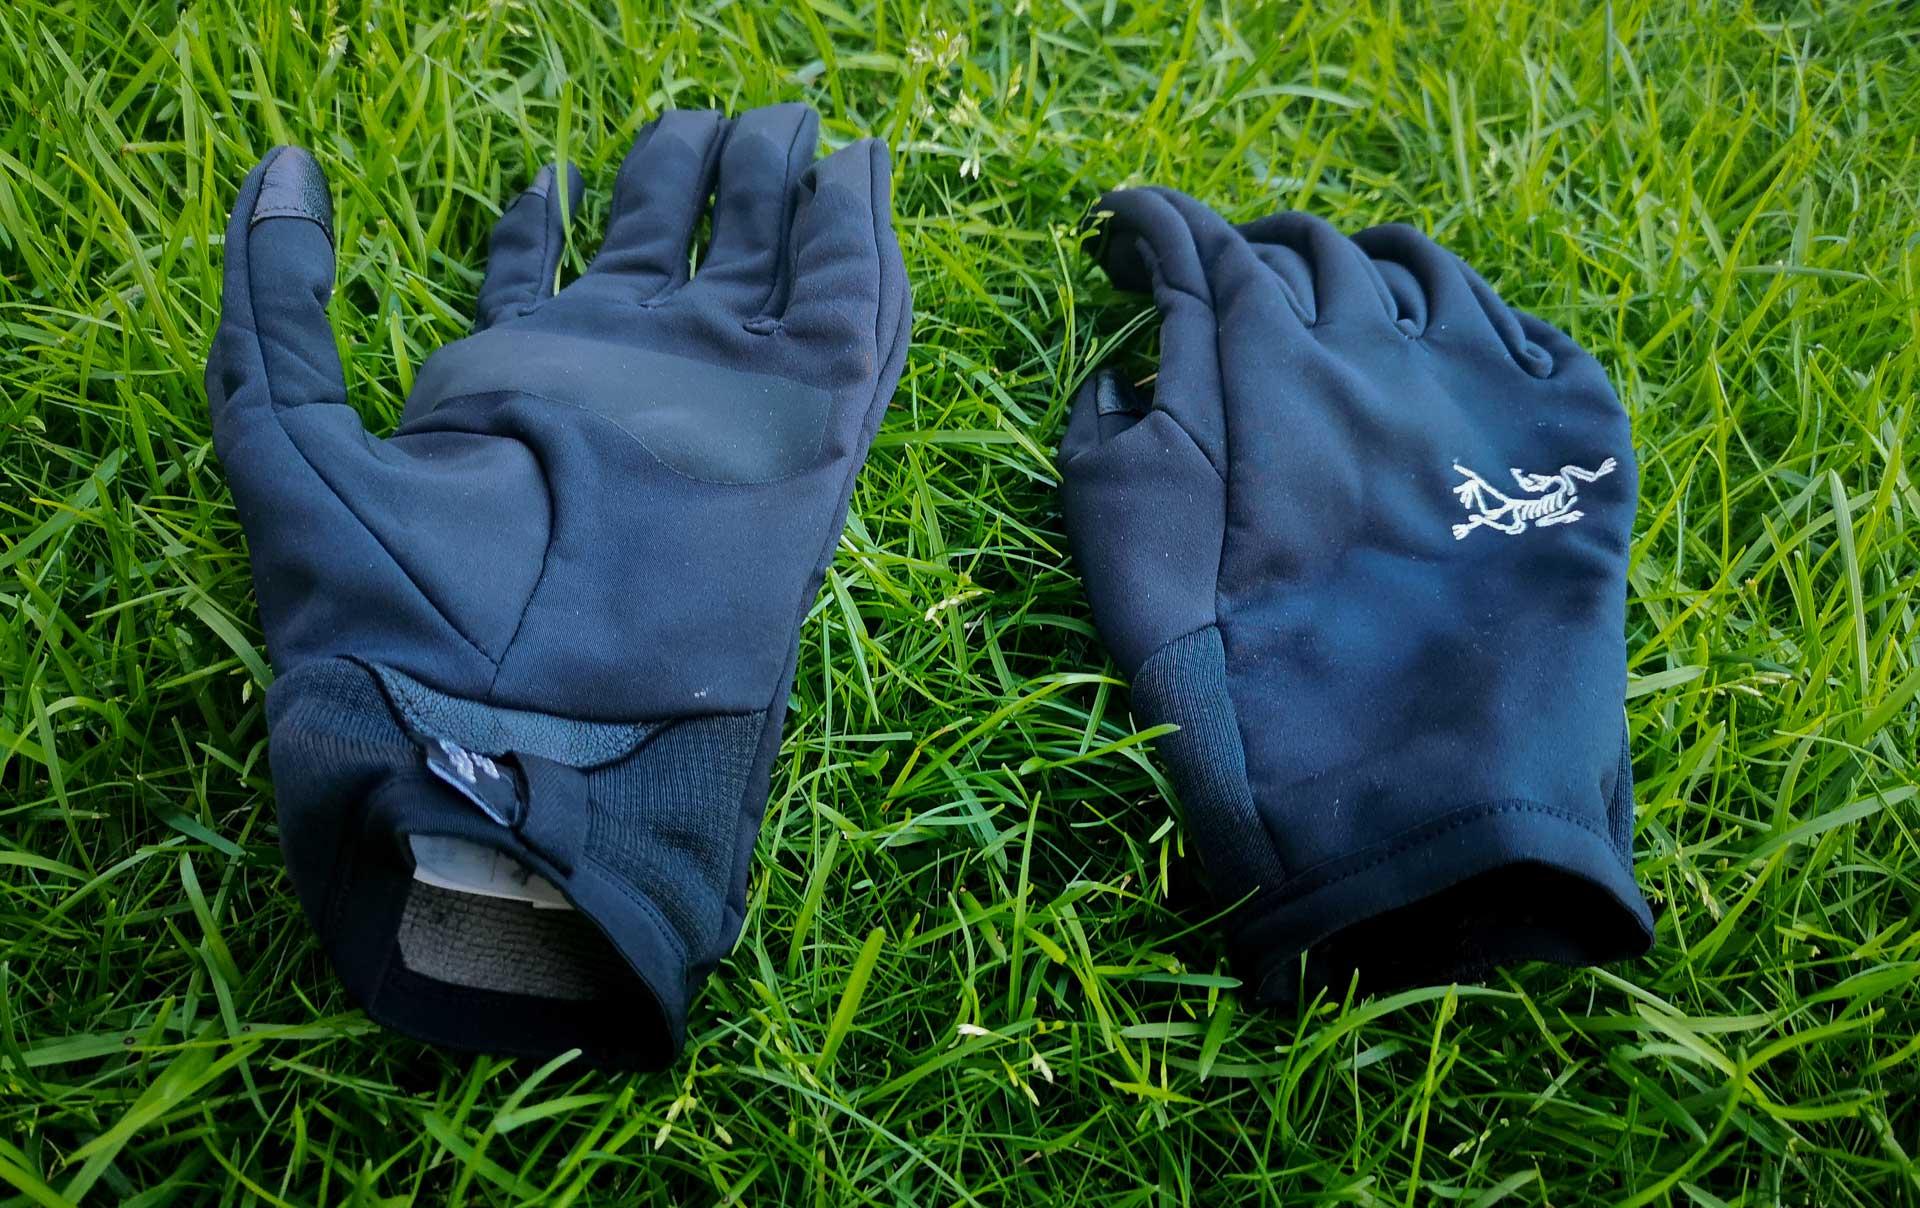 Arc'teryx-Venta-Glove.jpg